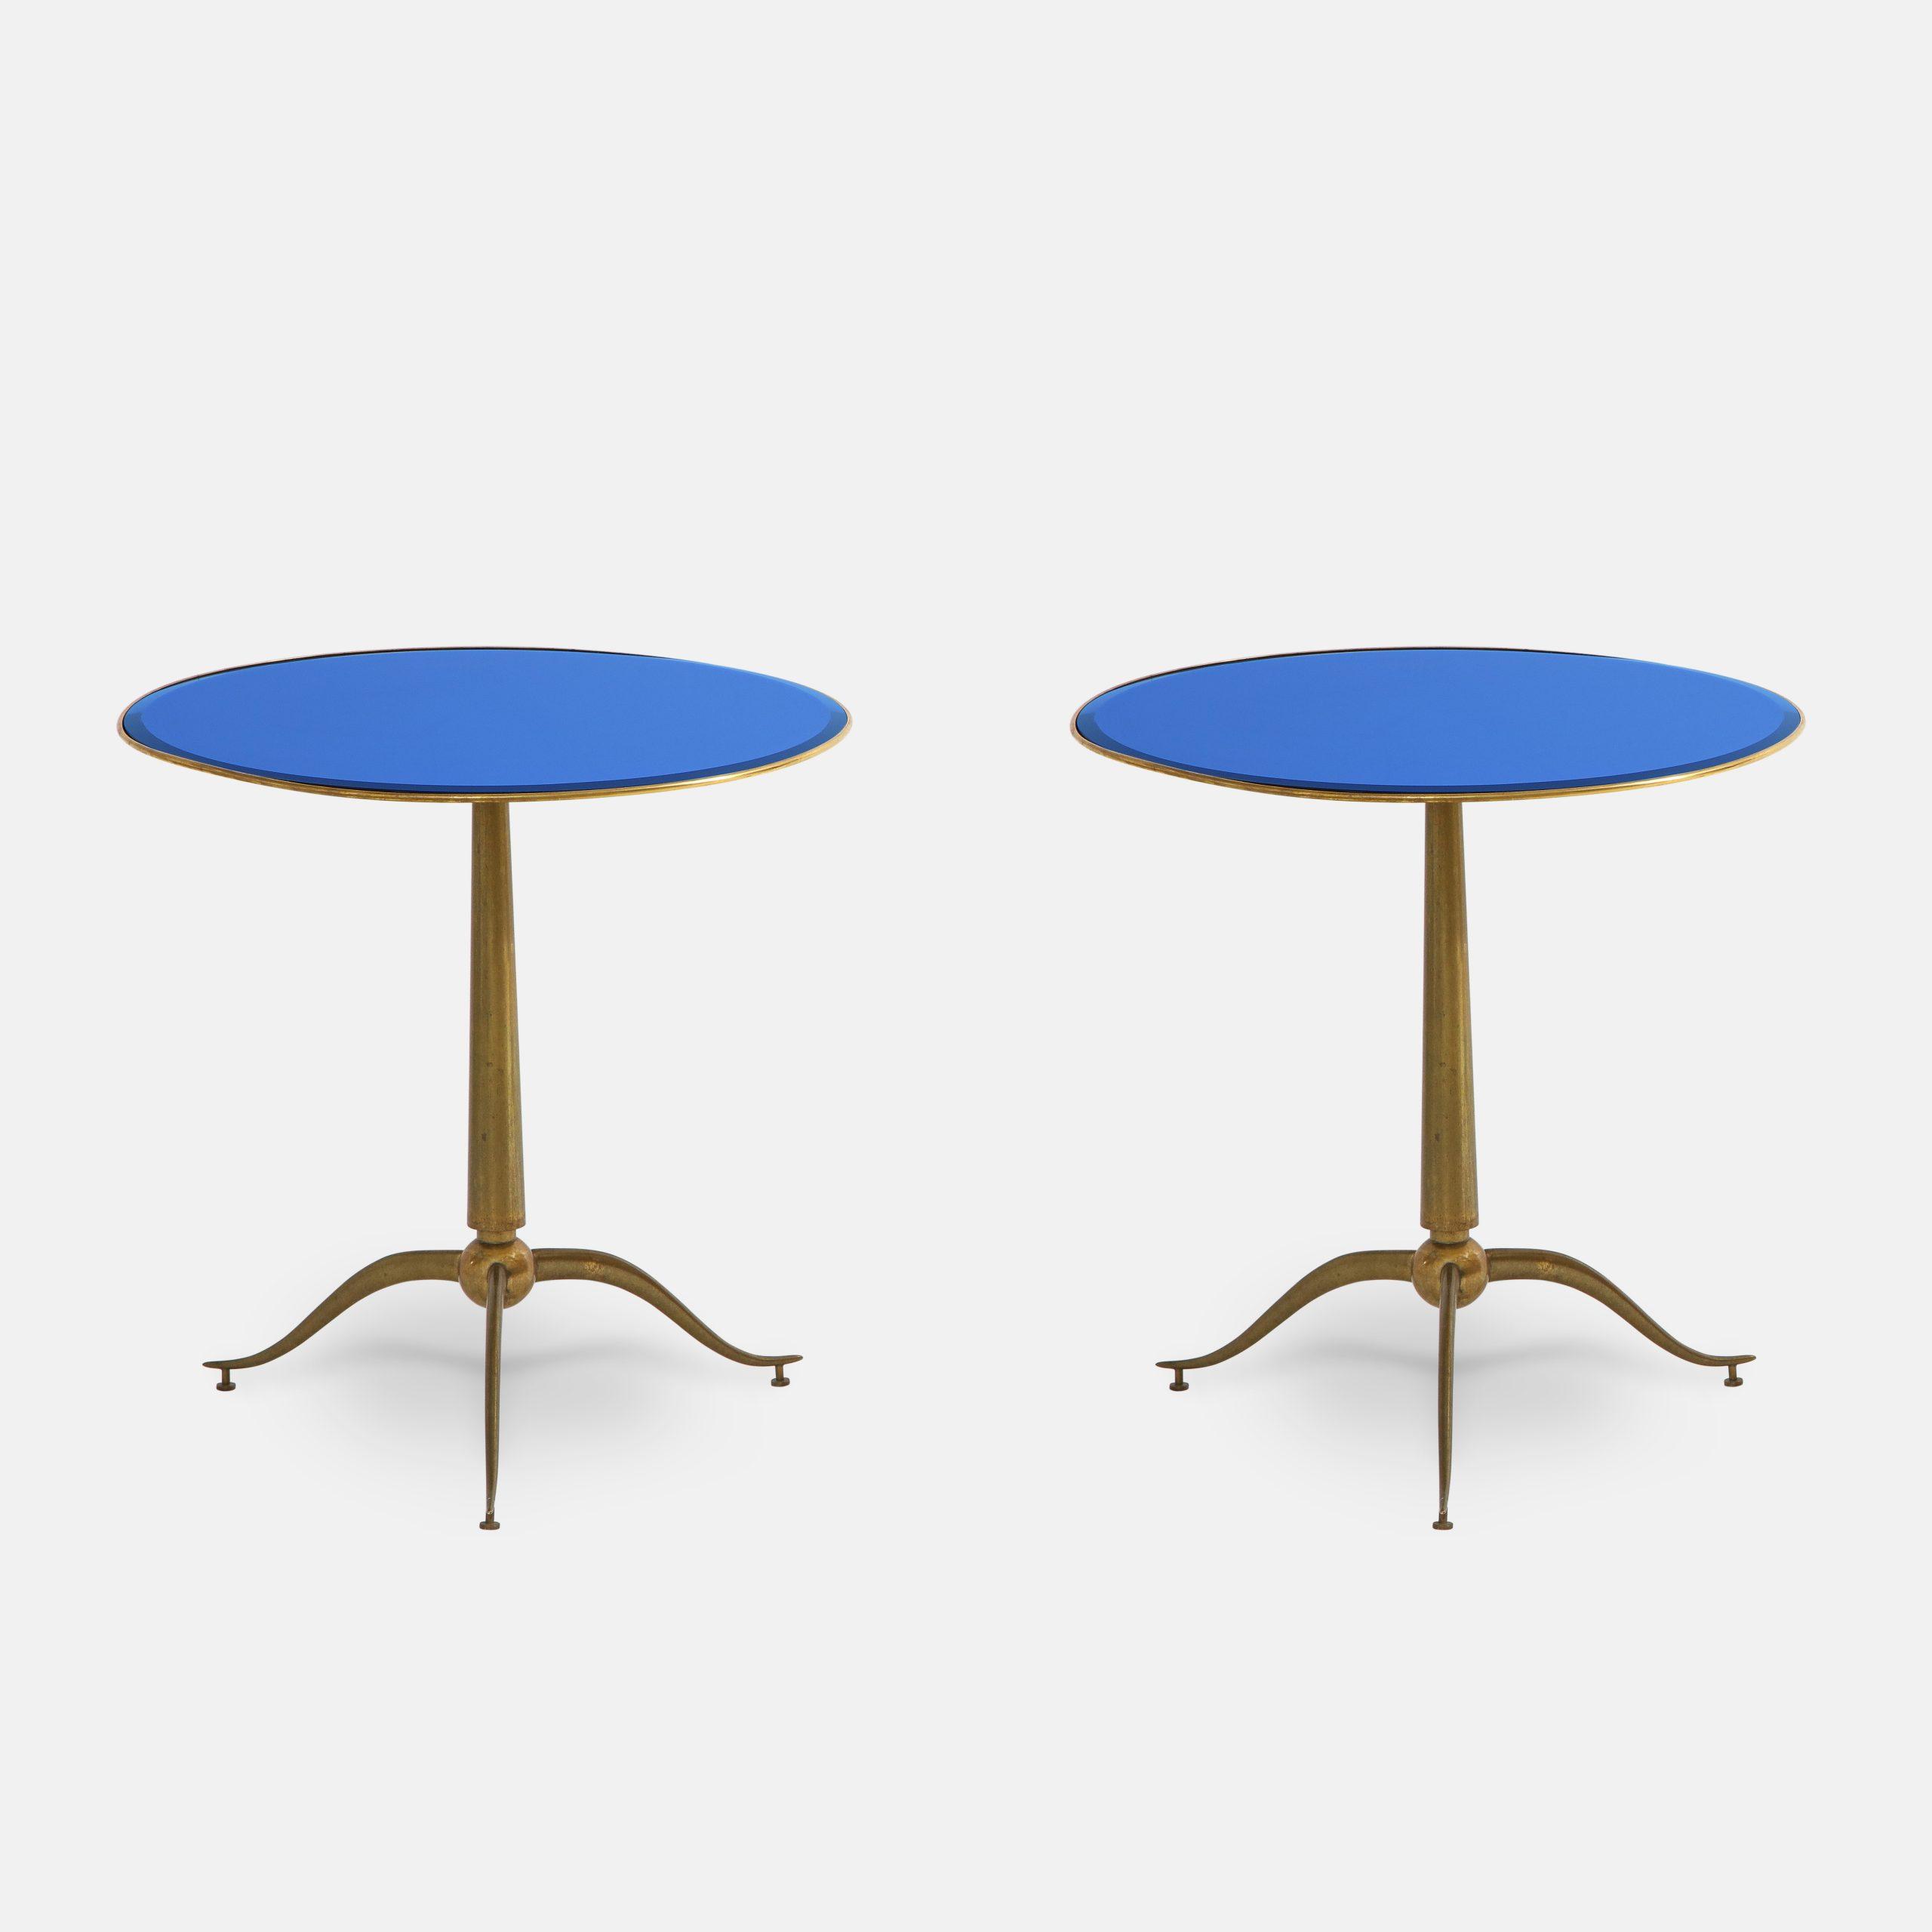 Rare Pair of Side Tables by Osvaldo Borsani for Arredamenti Borsani | soyun k.